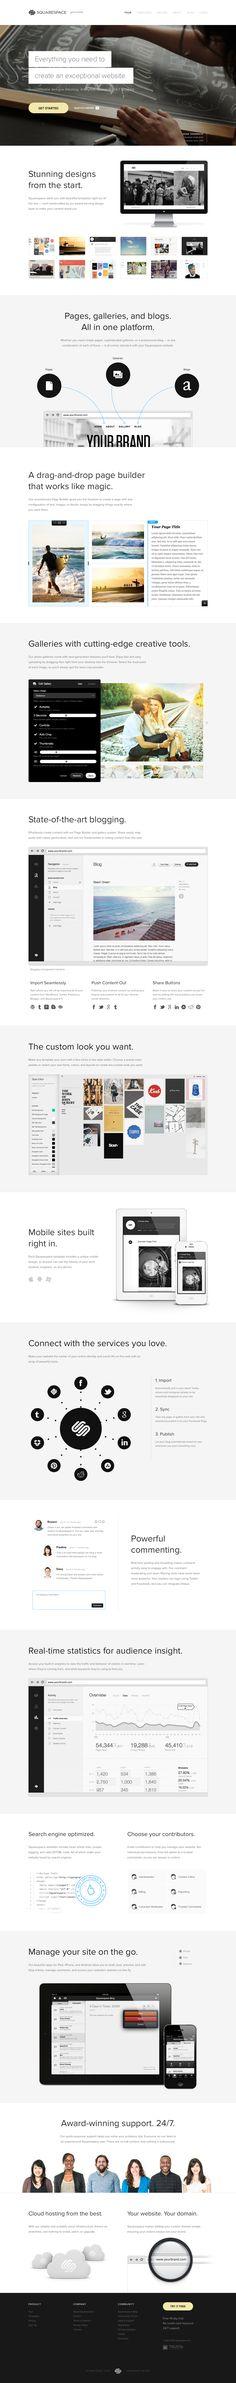 #webdesign #design #designer #inspiration #user #interface #ui #web    Stay up to date with daily web design news:  http://www.fb.com/mizkowebdesign